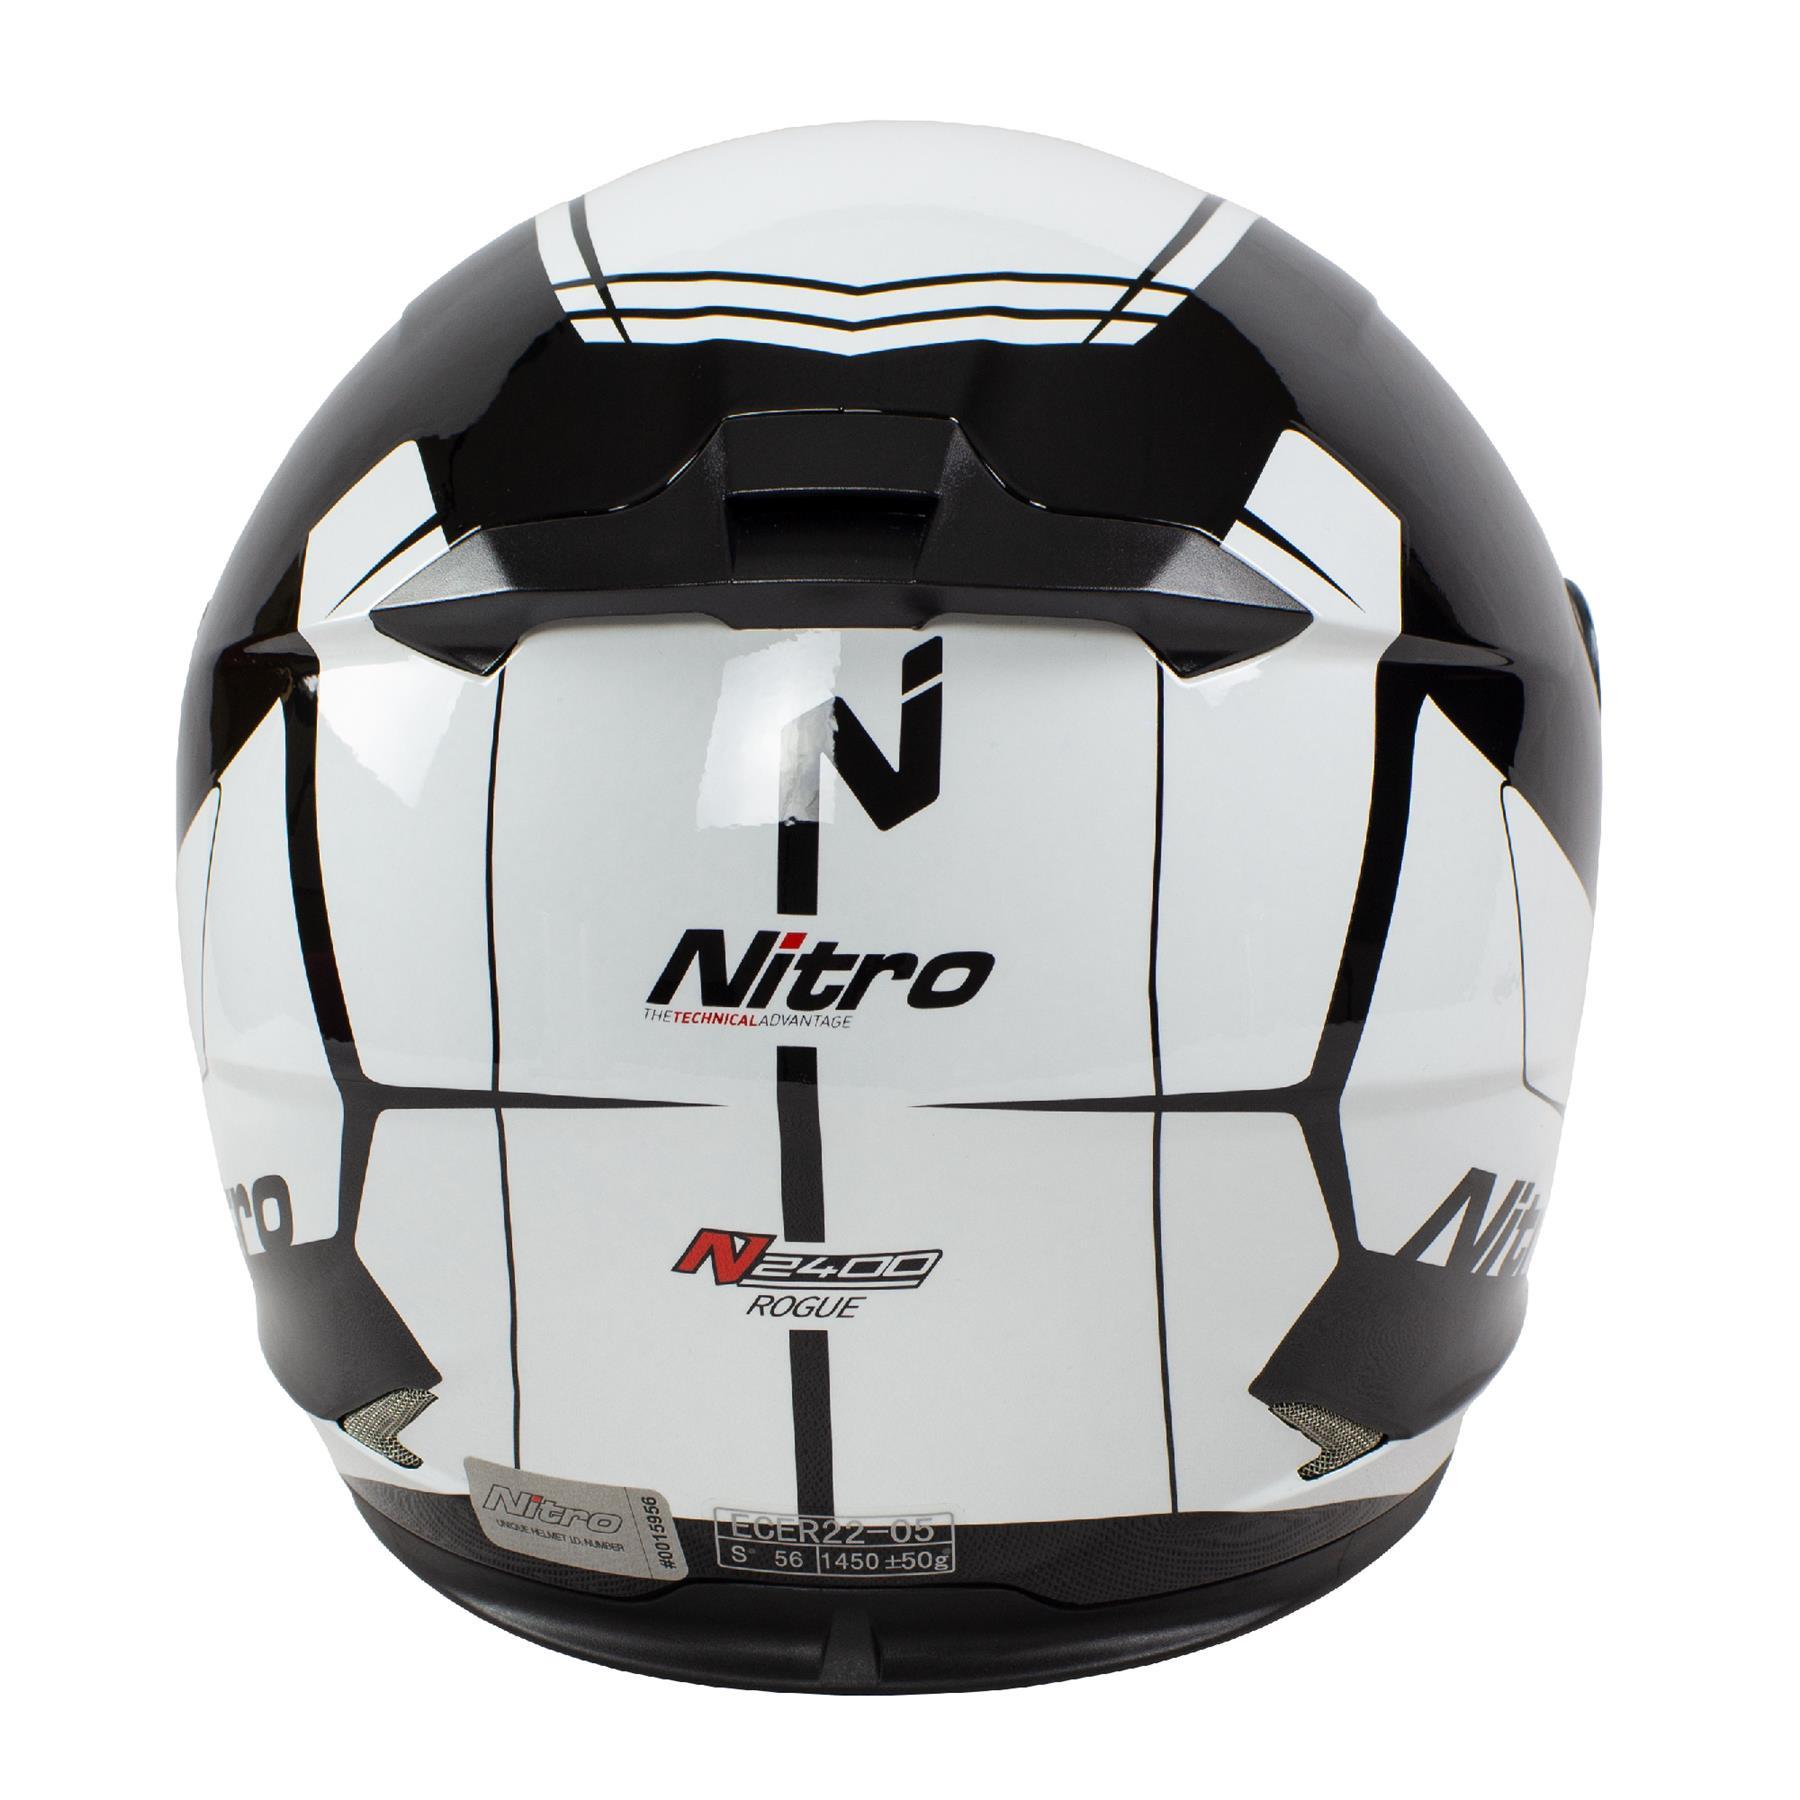 Nitro-N2400-Rogue-Full-Face-Motorcycle-Motorbike-Crash-Helmet-Black-Blue-Red thumbnail 27